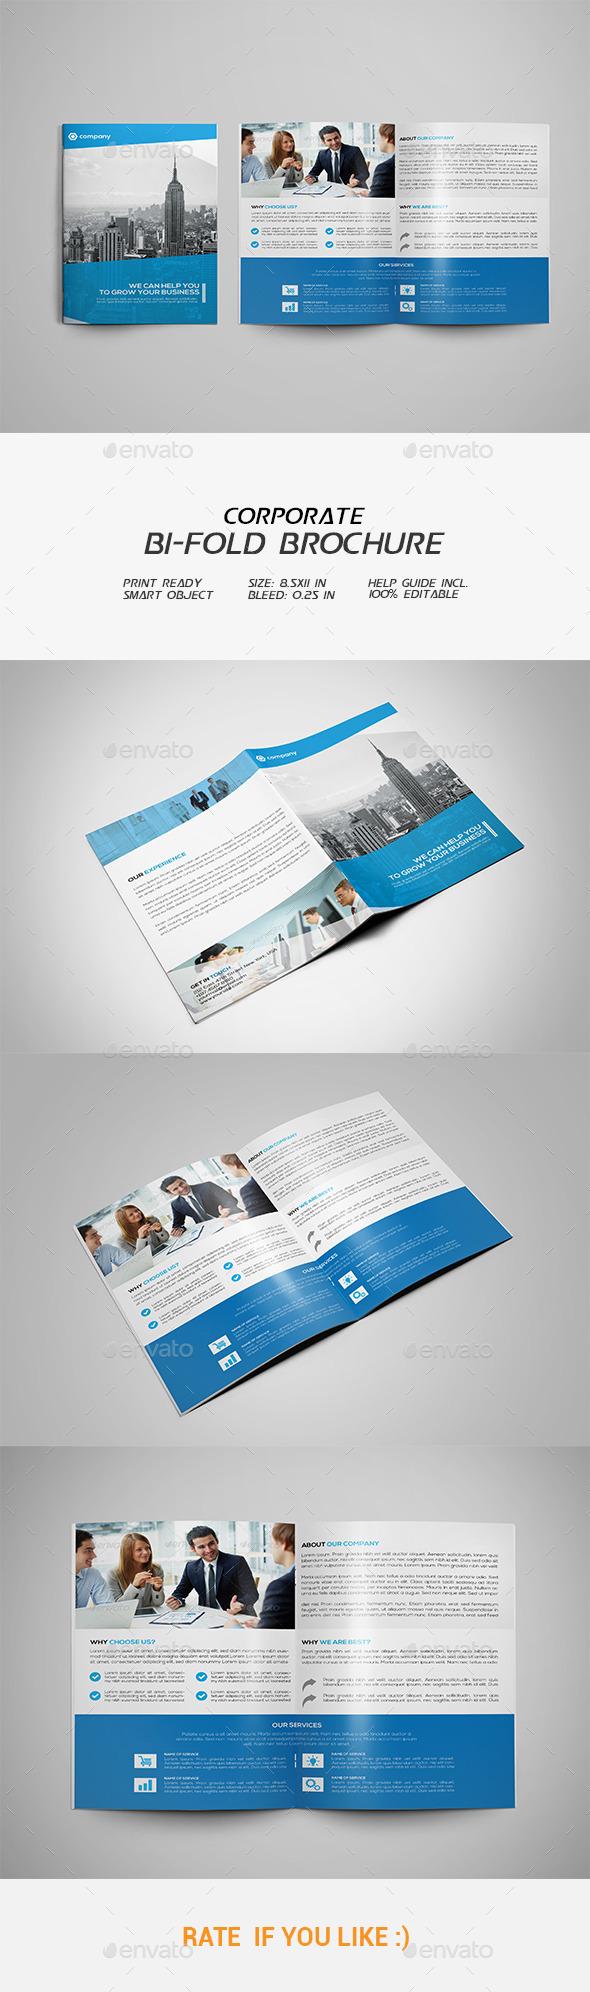 GraphicRiver Corporate Bi-fold Brochure 11793865